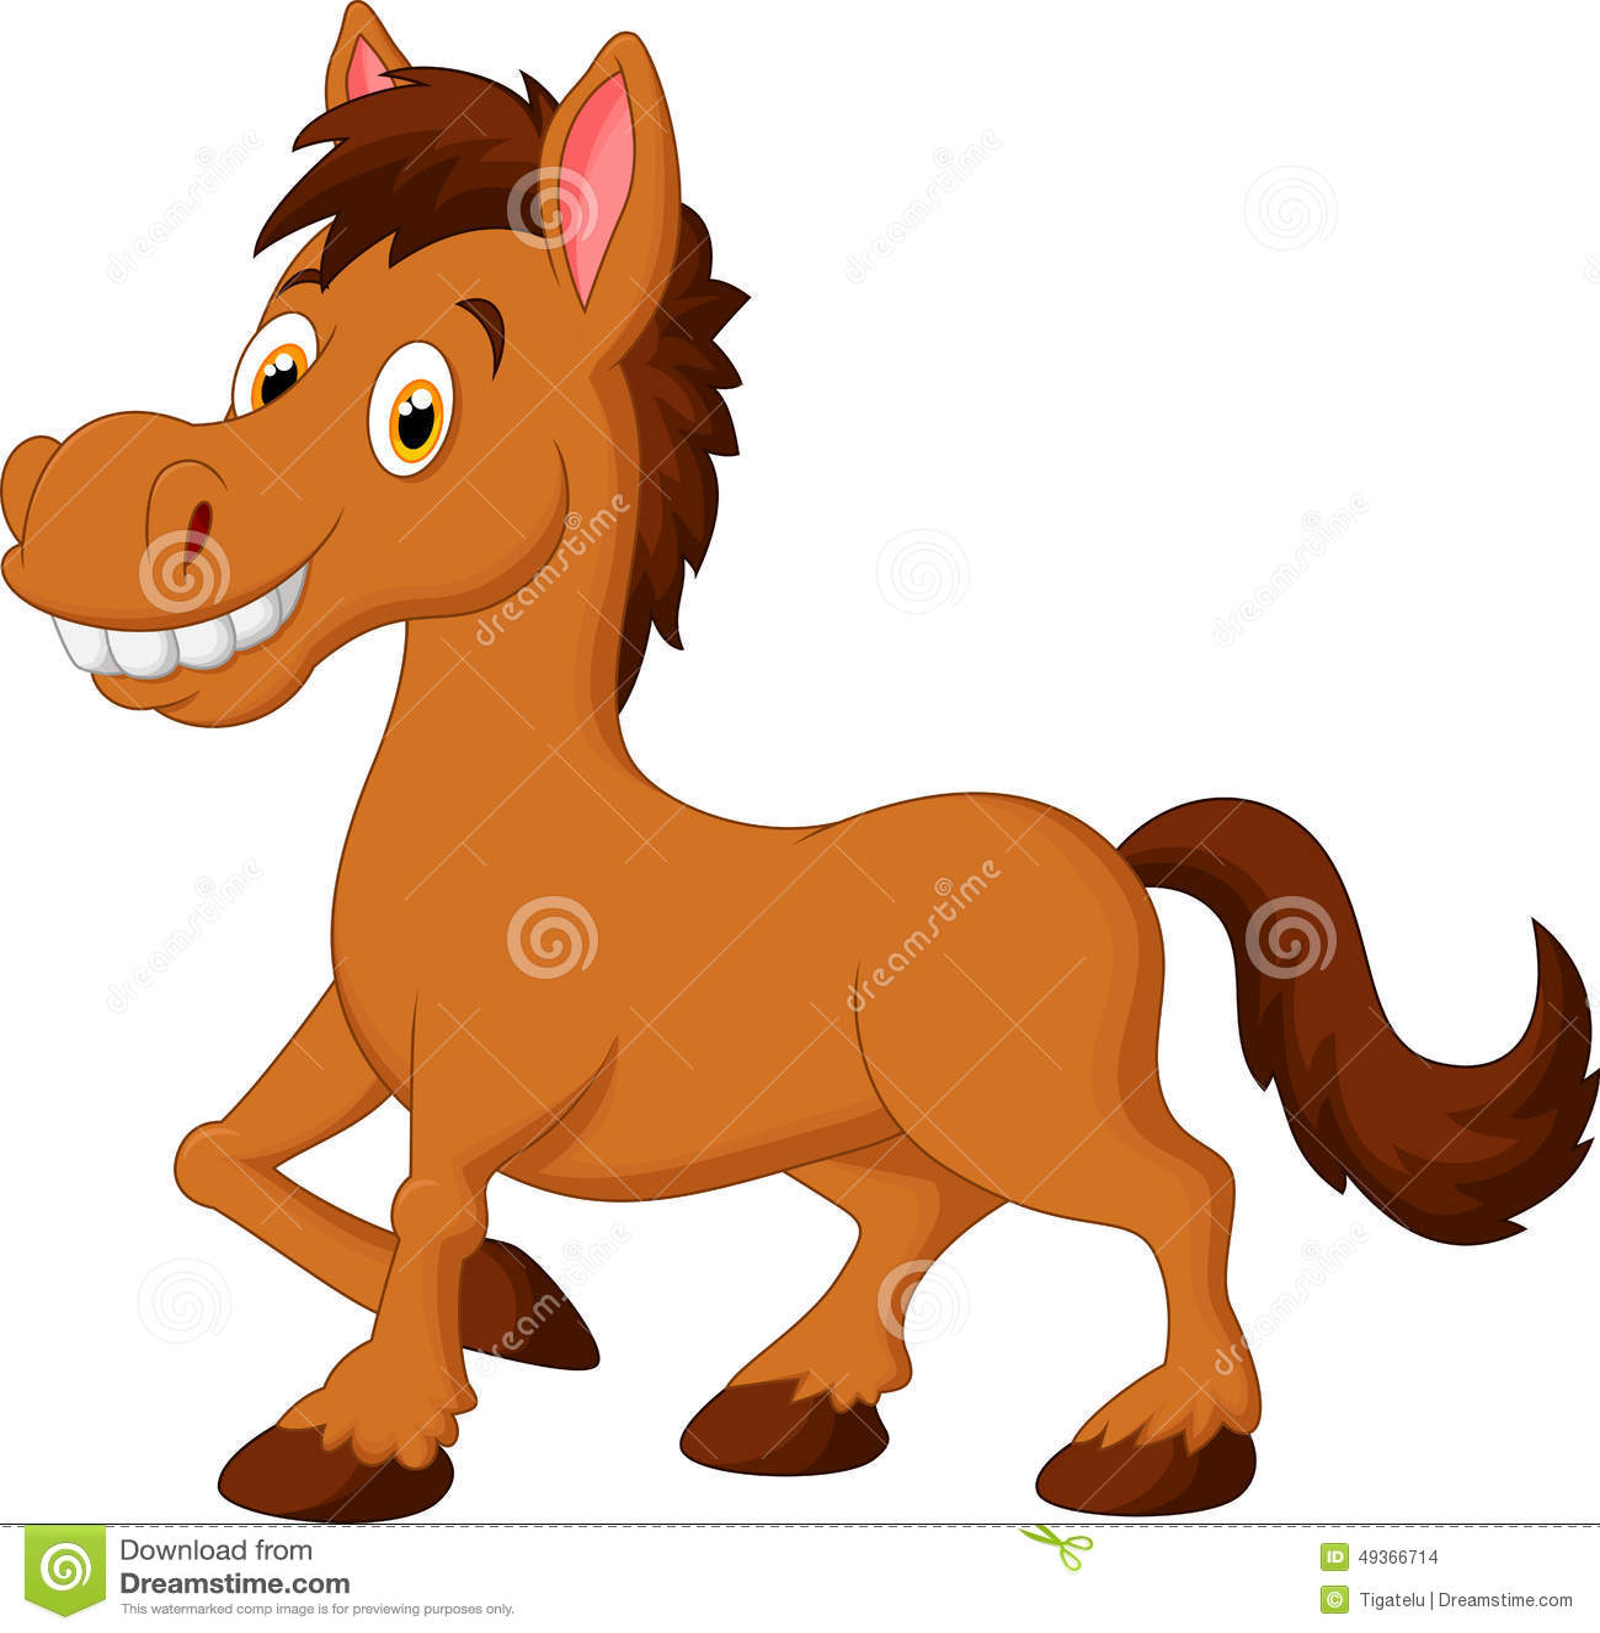 cute cartoon brown horse stock vector illustration of comic 49366714 rh dreamstime com cute baby horse clipart Cute Pig Clip Art